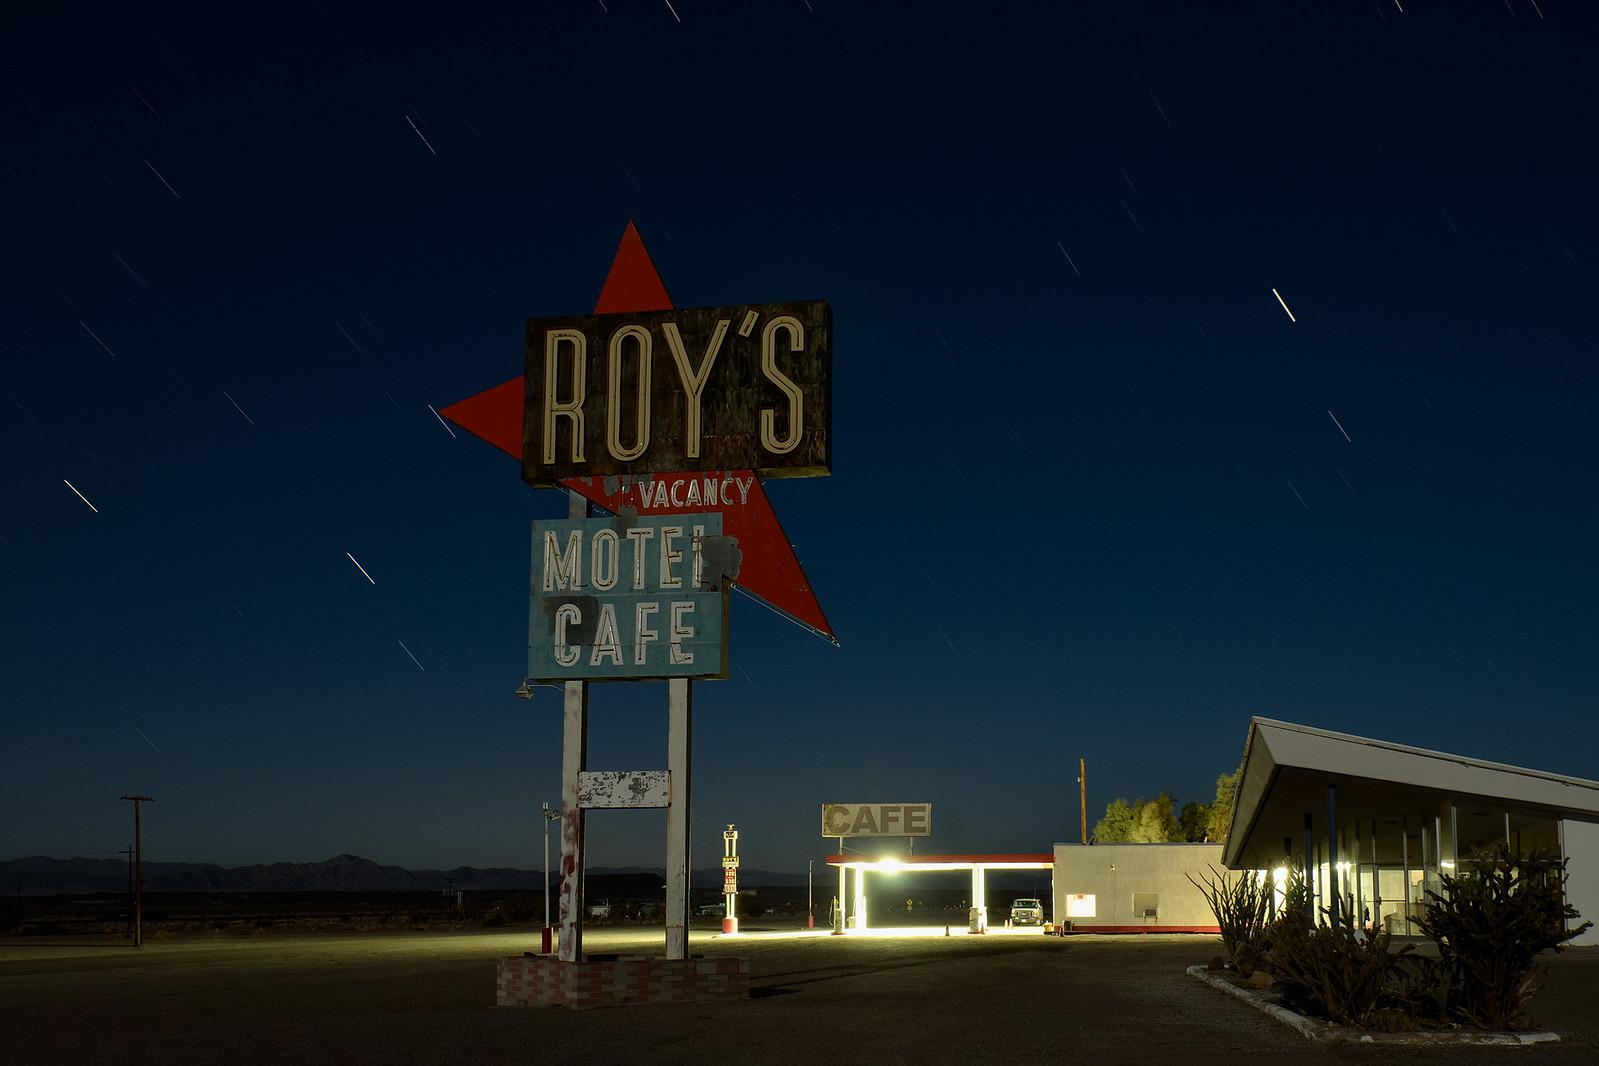 roy's motel & cafe. amboy, ca. 2014.